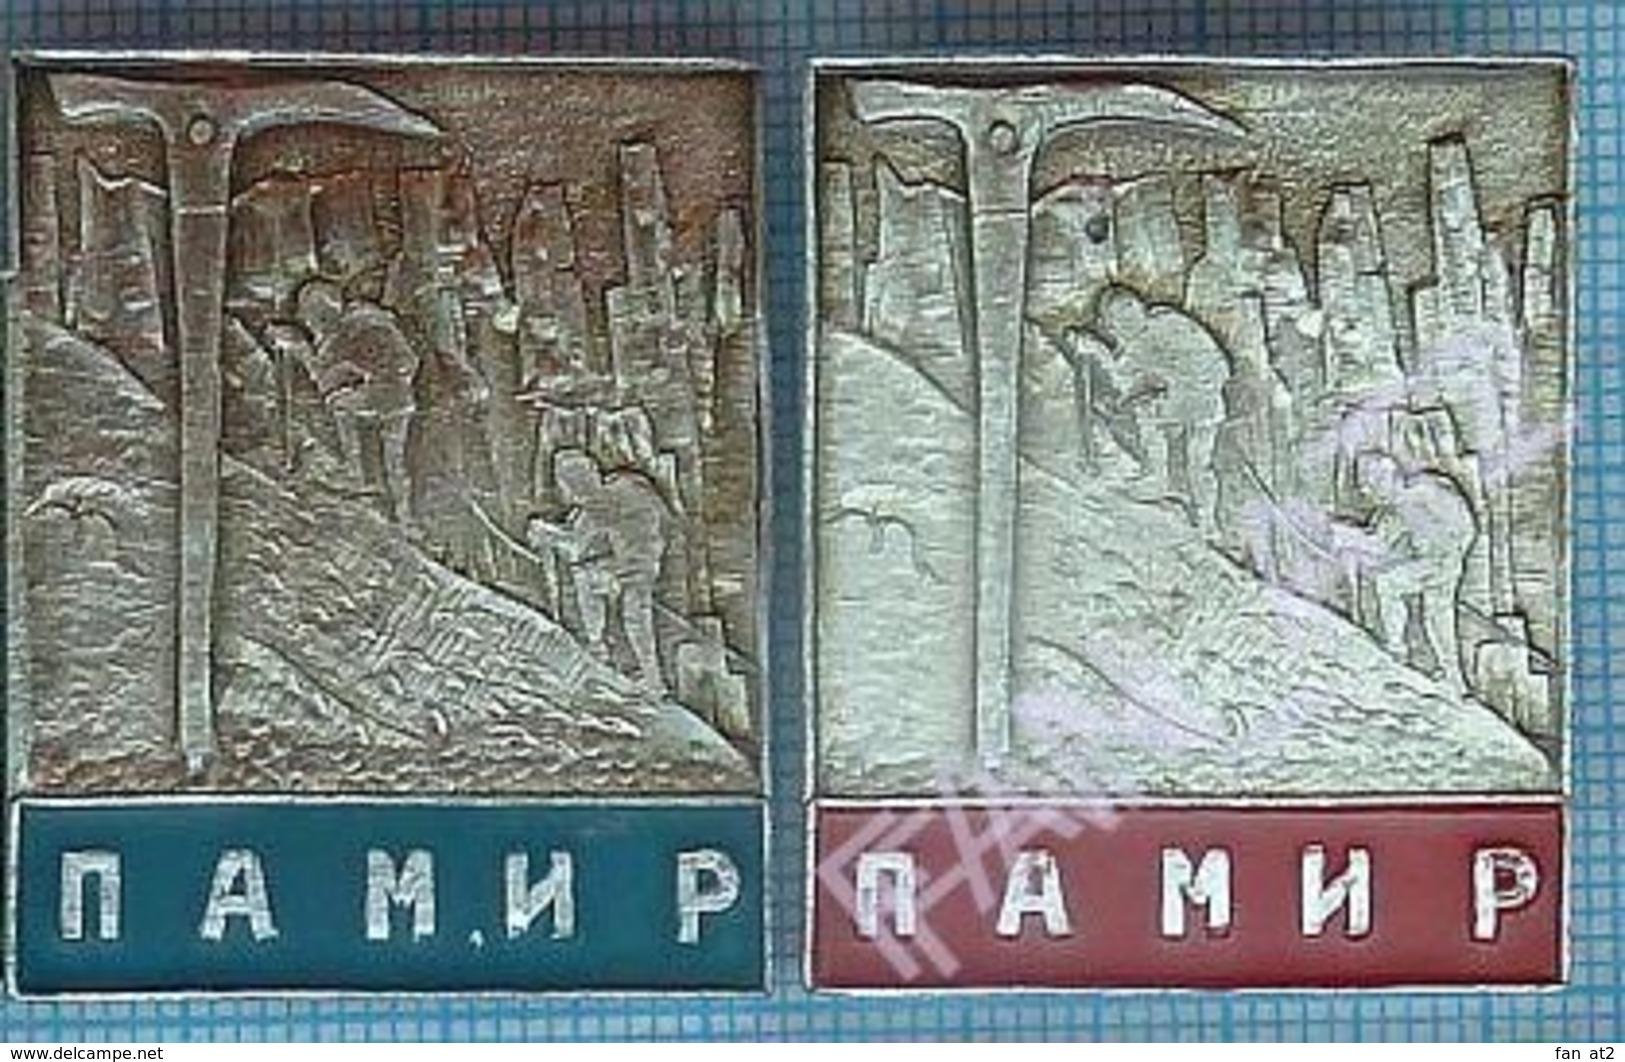 USSR / Badges / Soviet Union / Tajikistan Alpinism Mountaineering Tourism Pamir Mountains. - Alpinism, Mountaineering